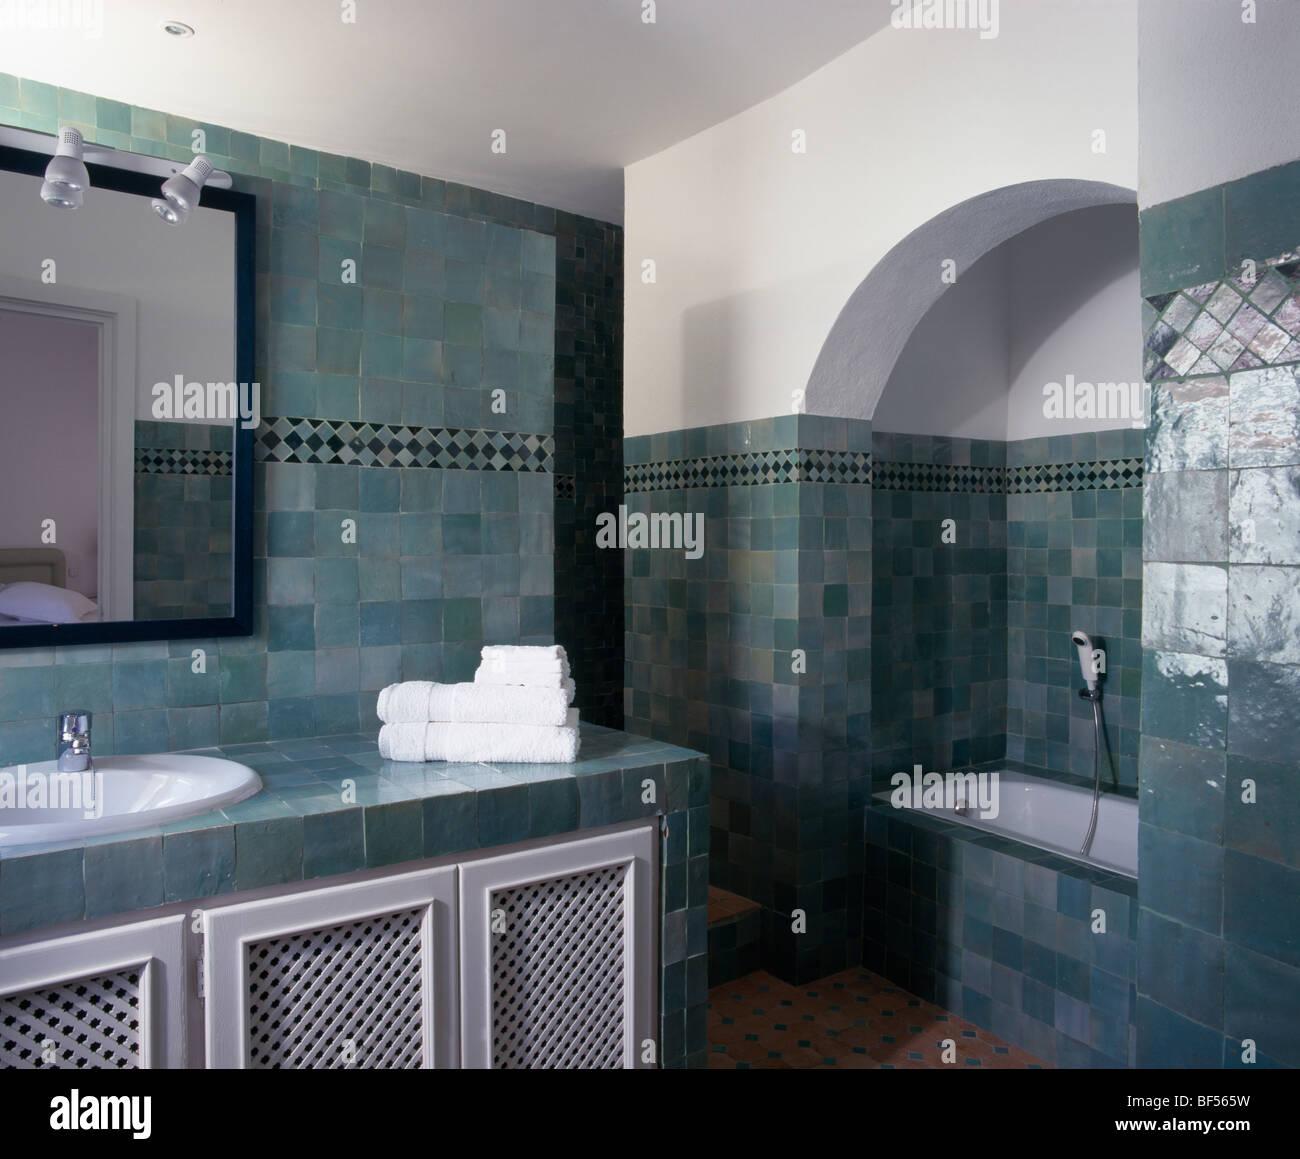 Bathroom Tiling Alcove Stock Photos & Bathroom Tiling Alcove Stock ...